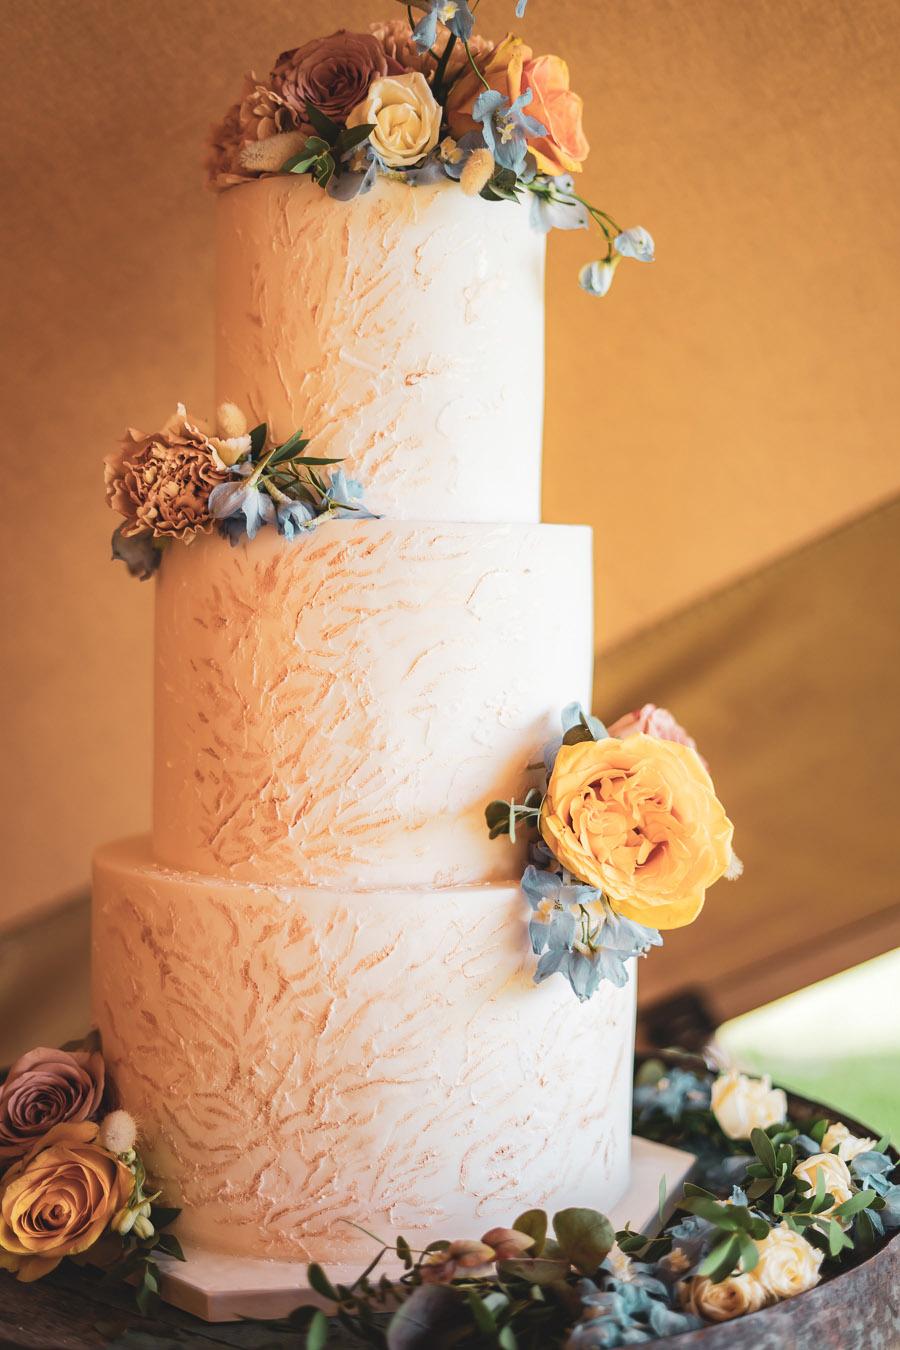 Sophisticated Boho - The New Intimate Wedding (21)